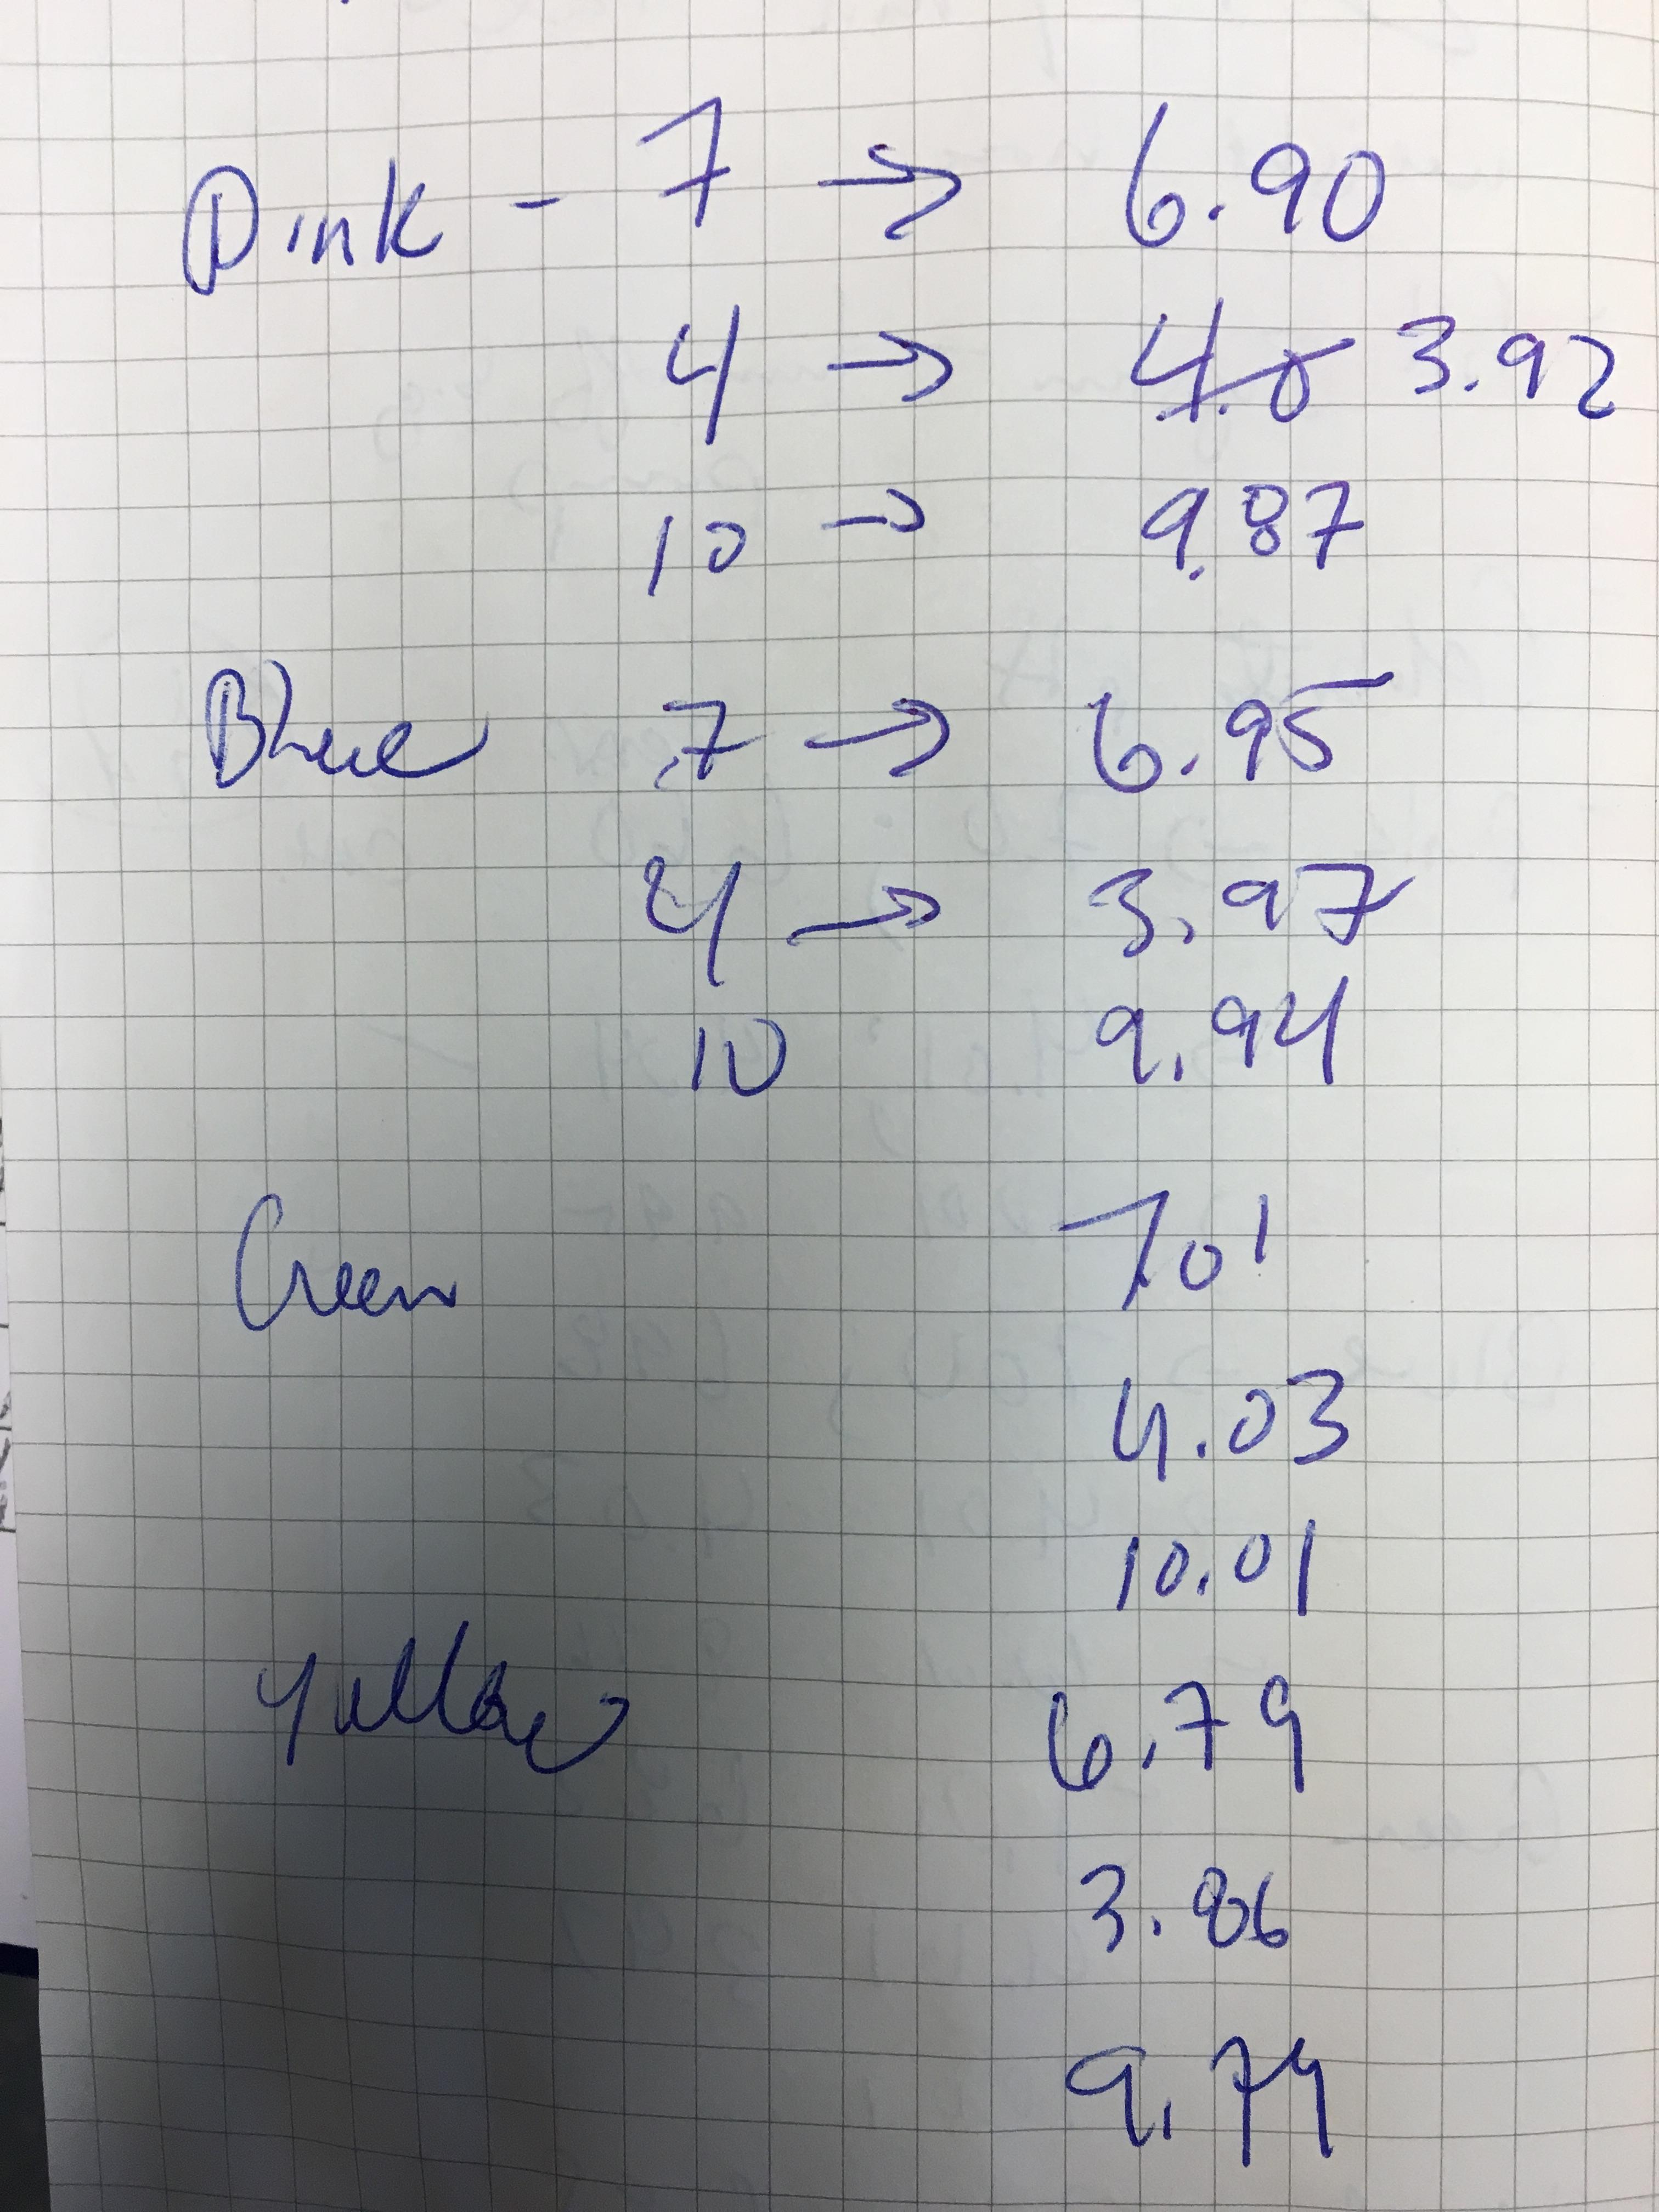 2016-01-29 09.51.48